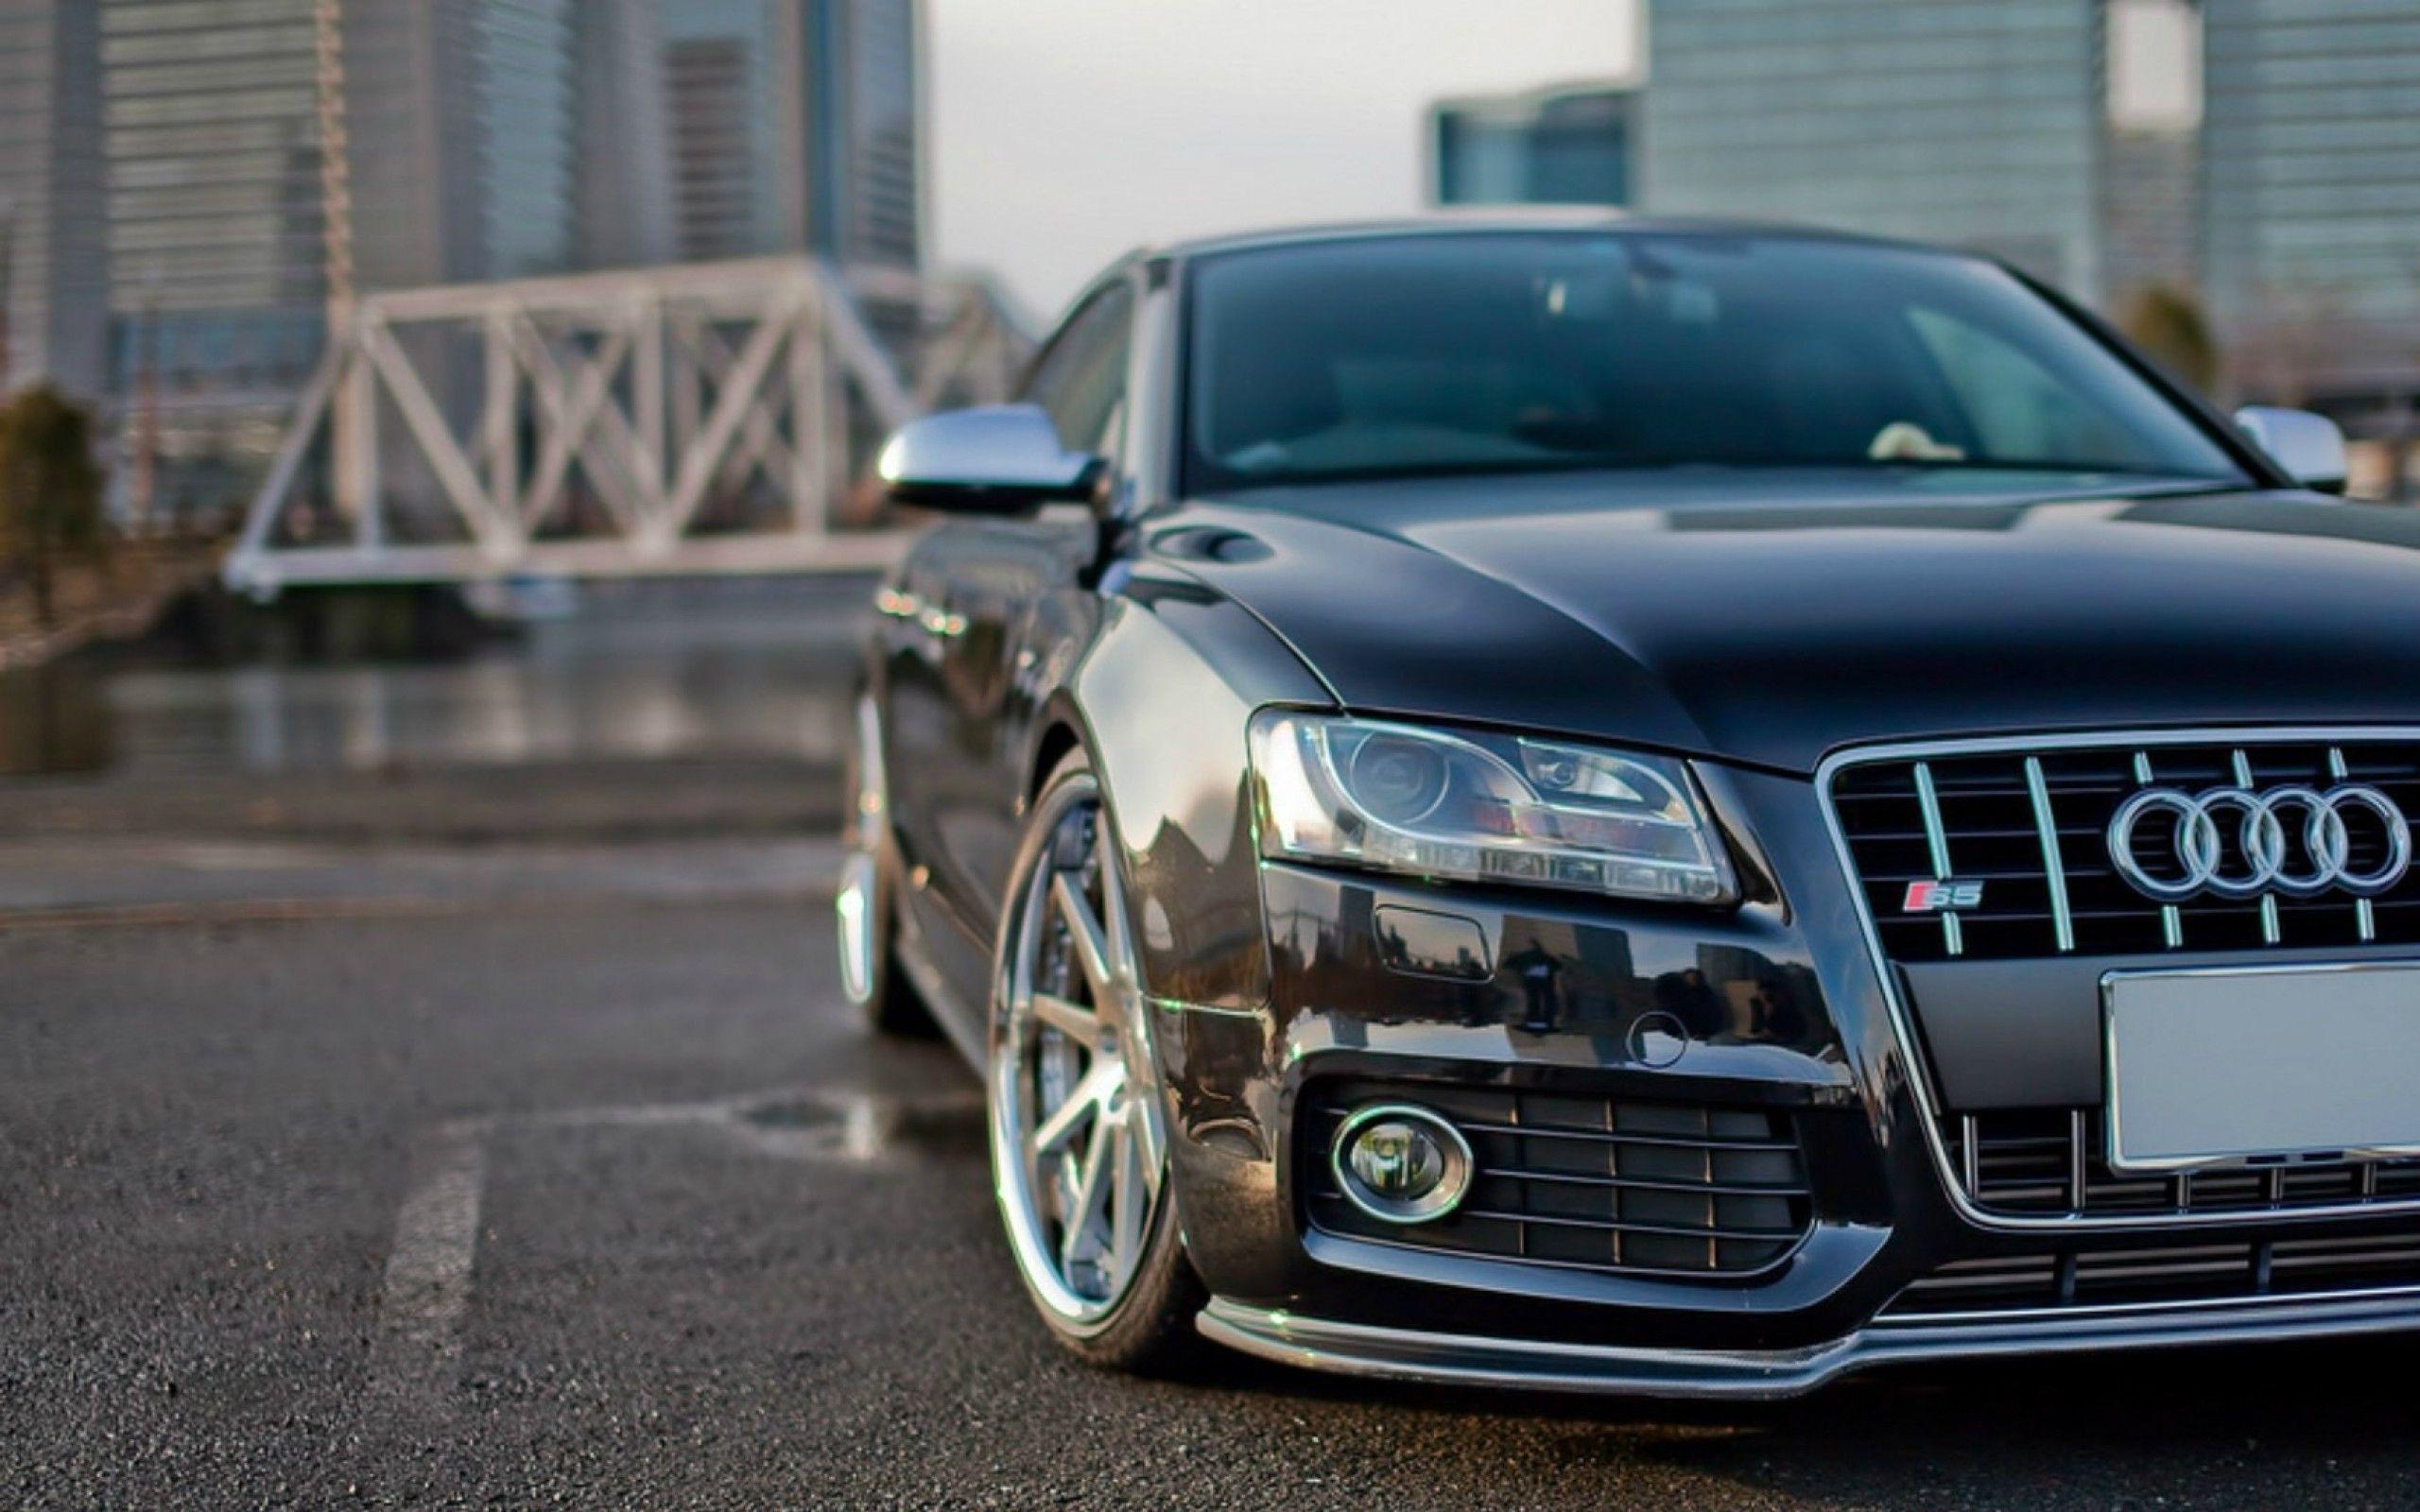 Audi S4 4k Wallpapers Top Free Audi S4 4k Backgrounds Wallpaperaccess